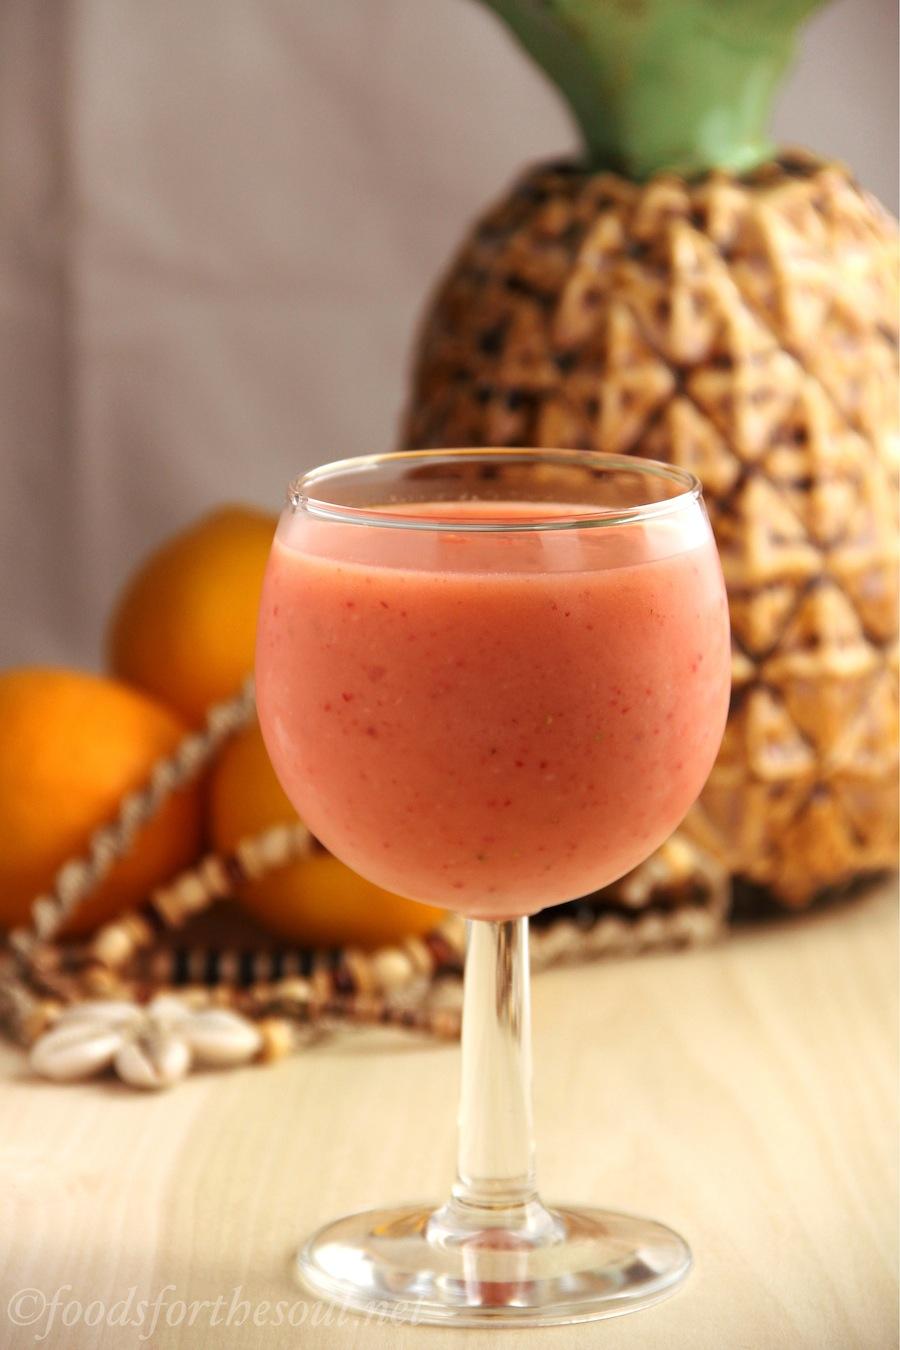 strawberry surf rider jamba juice smoothie